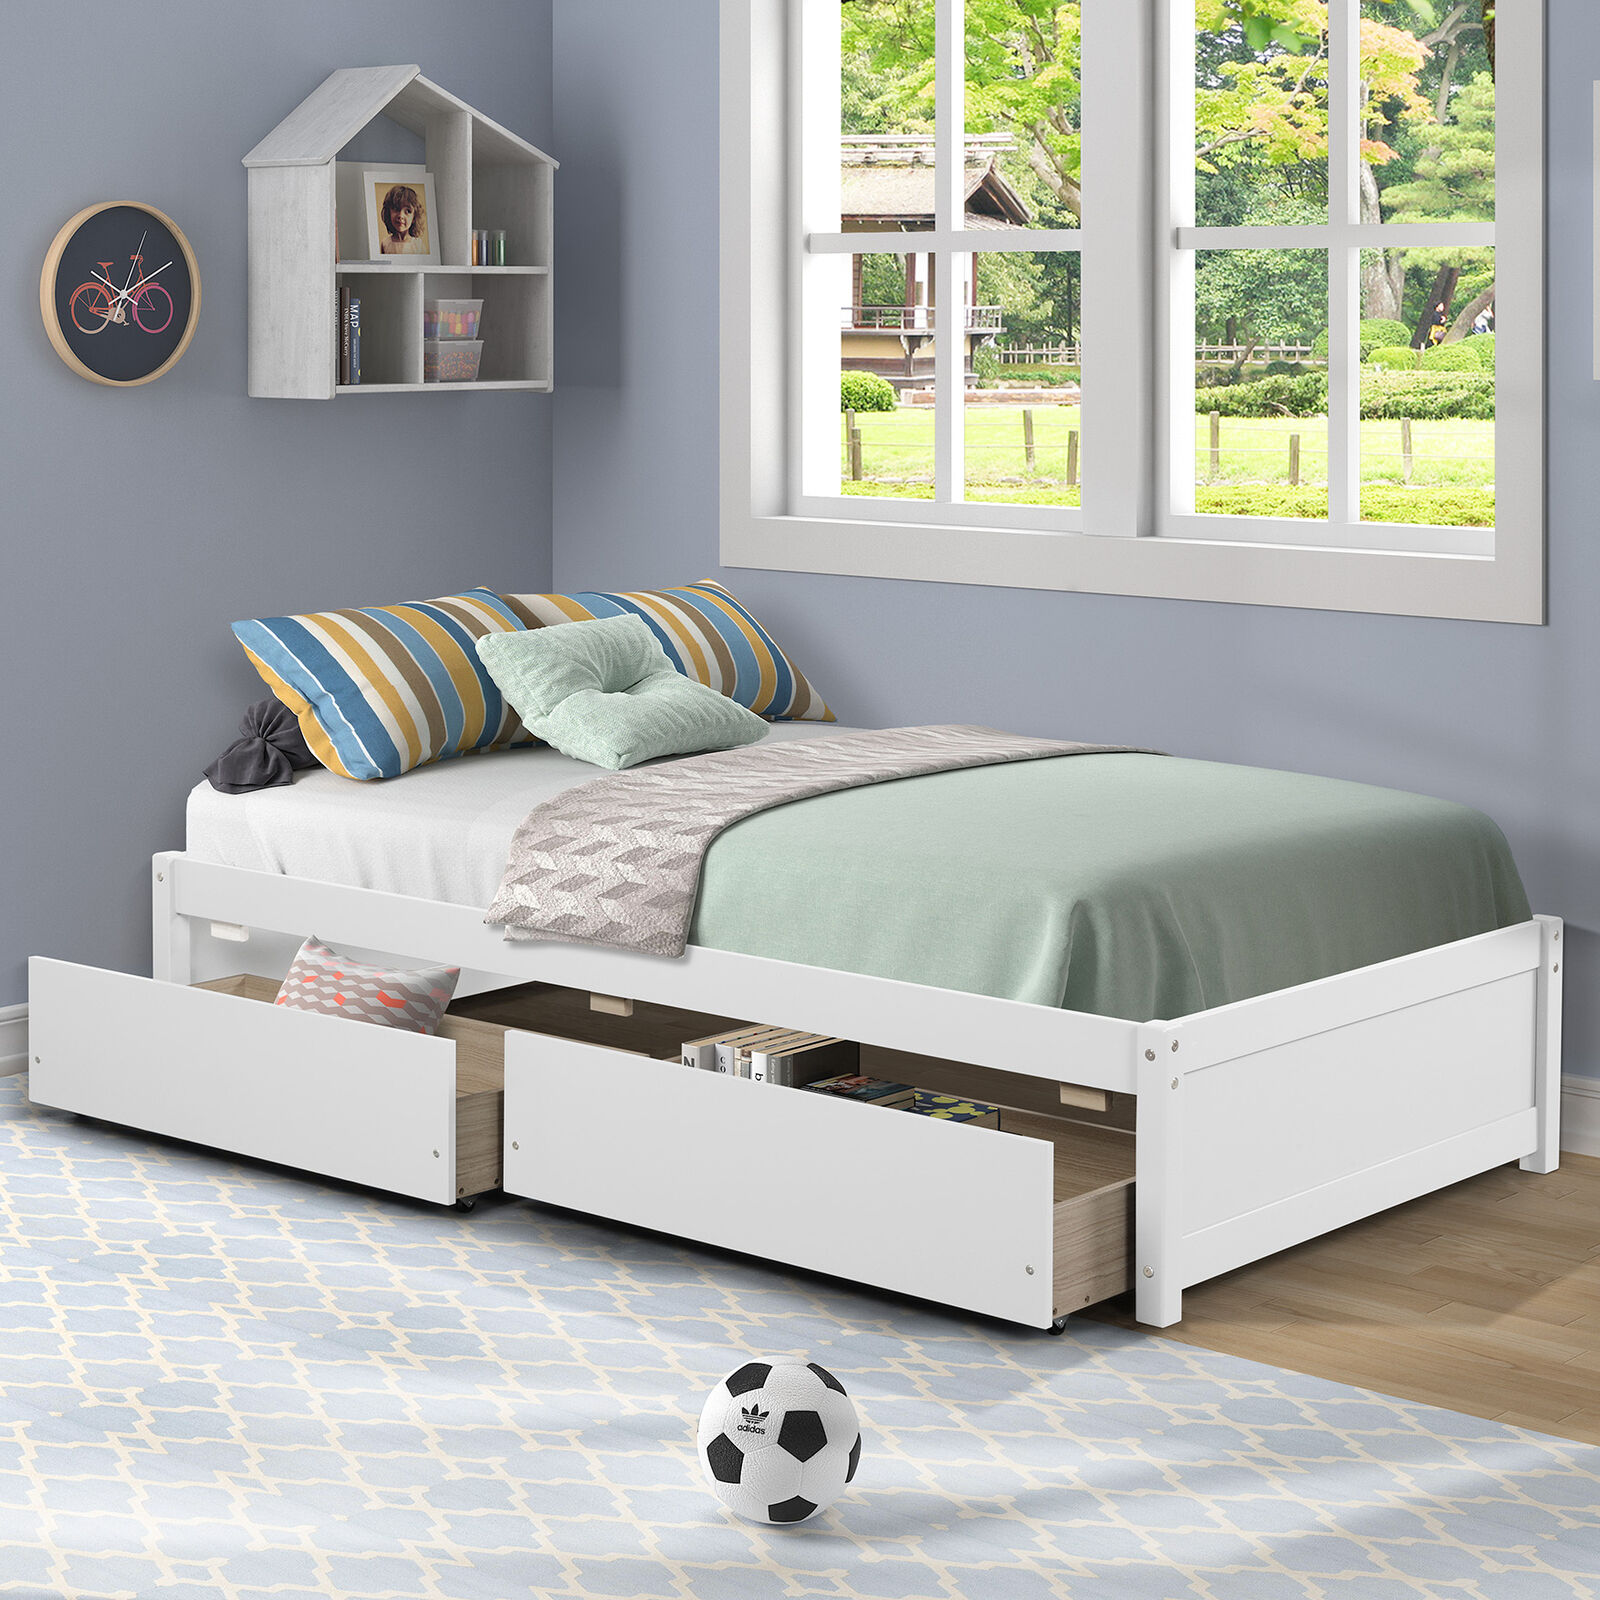 White Bed Frame With Storage Ikea Brimnes For Sale Online Ebay